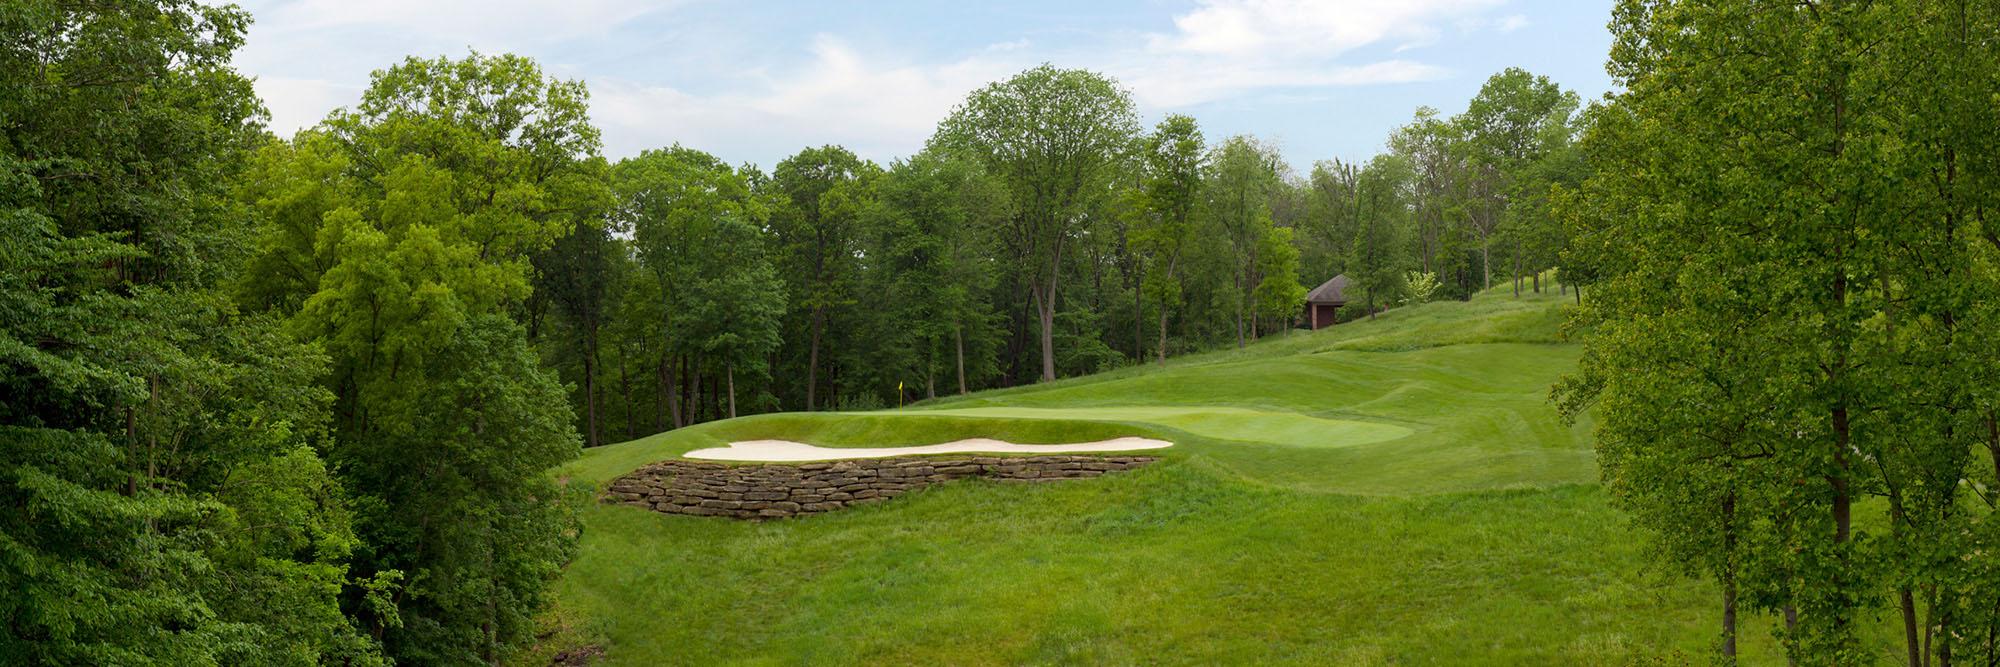 Golf Course Image - Nevillewood No. 5